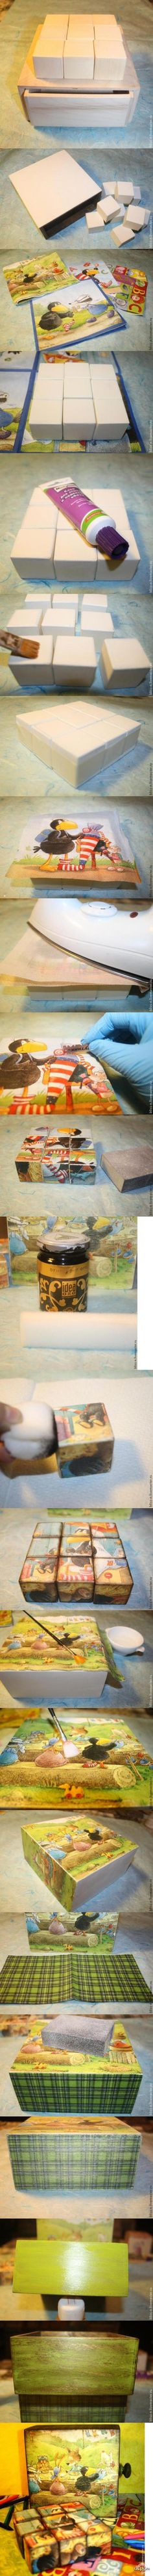 "Декупаж - Сайт любителей декупажа - DCPG.RU | Винтажные кубики ""Детство"" Click on photo to see more! Нажмите на фото чтобы увидеть больше! decoupage art craft handmade home decor DIY do it yourself tutorial Materials and techniques: acrylic paint staining varnish wax etc."